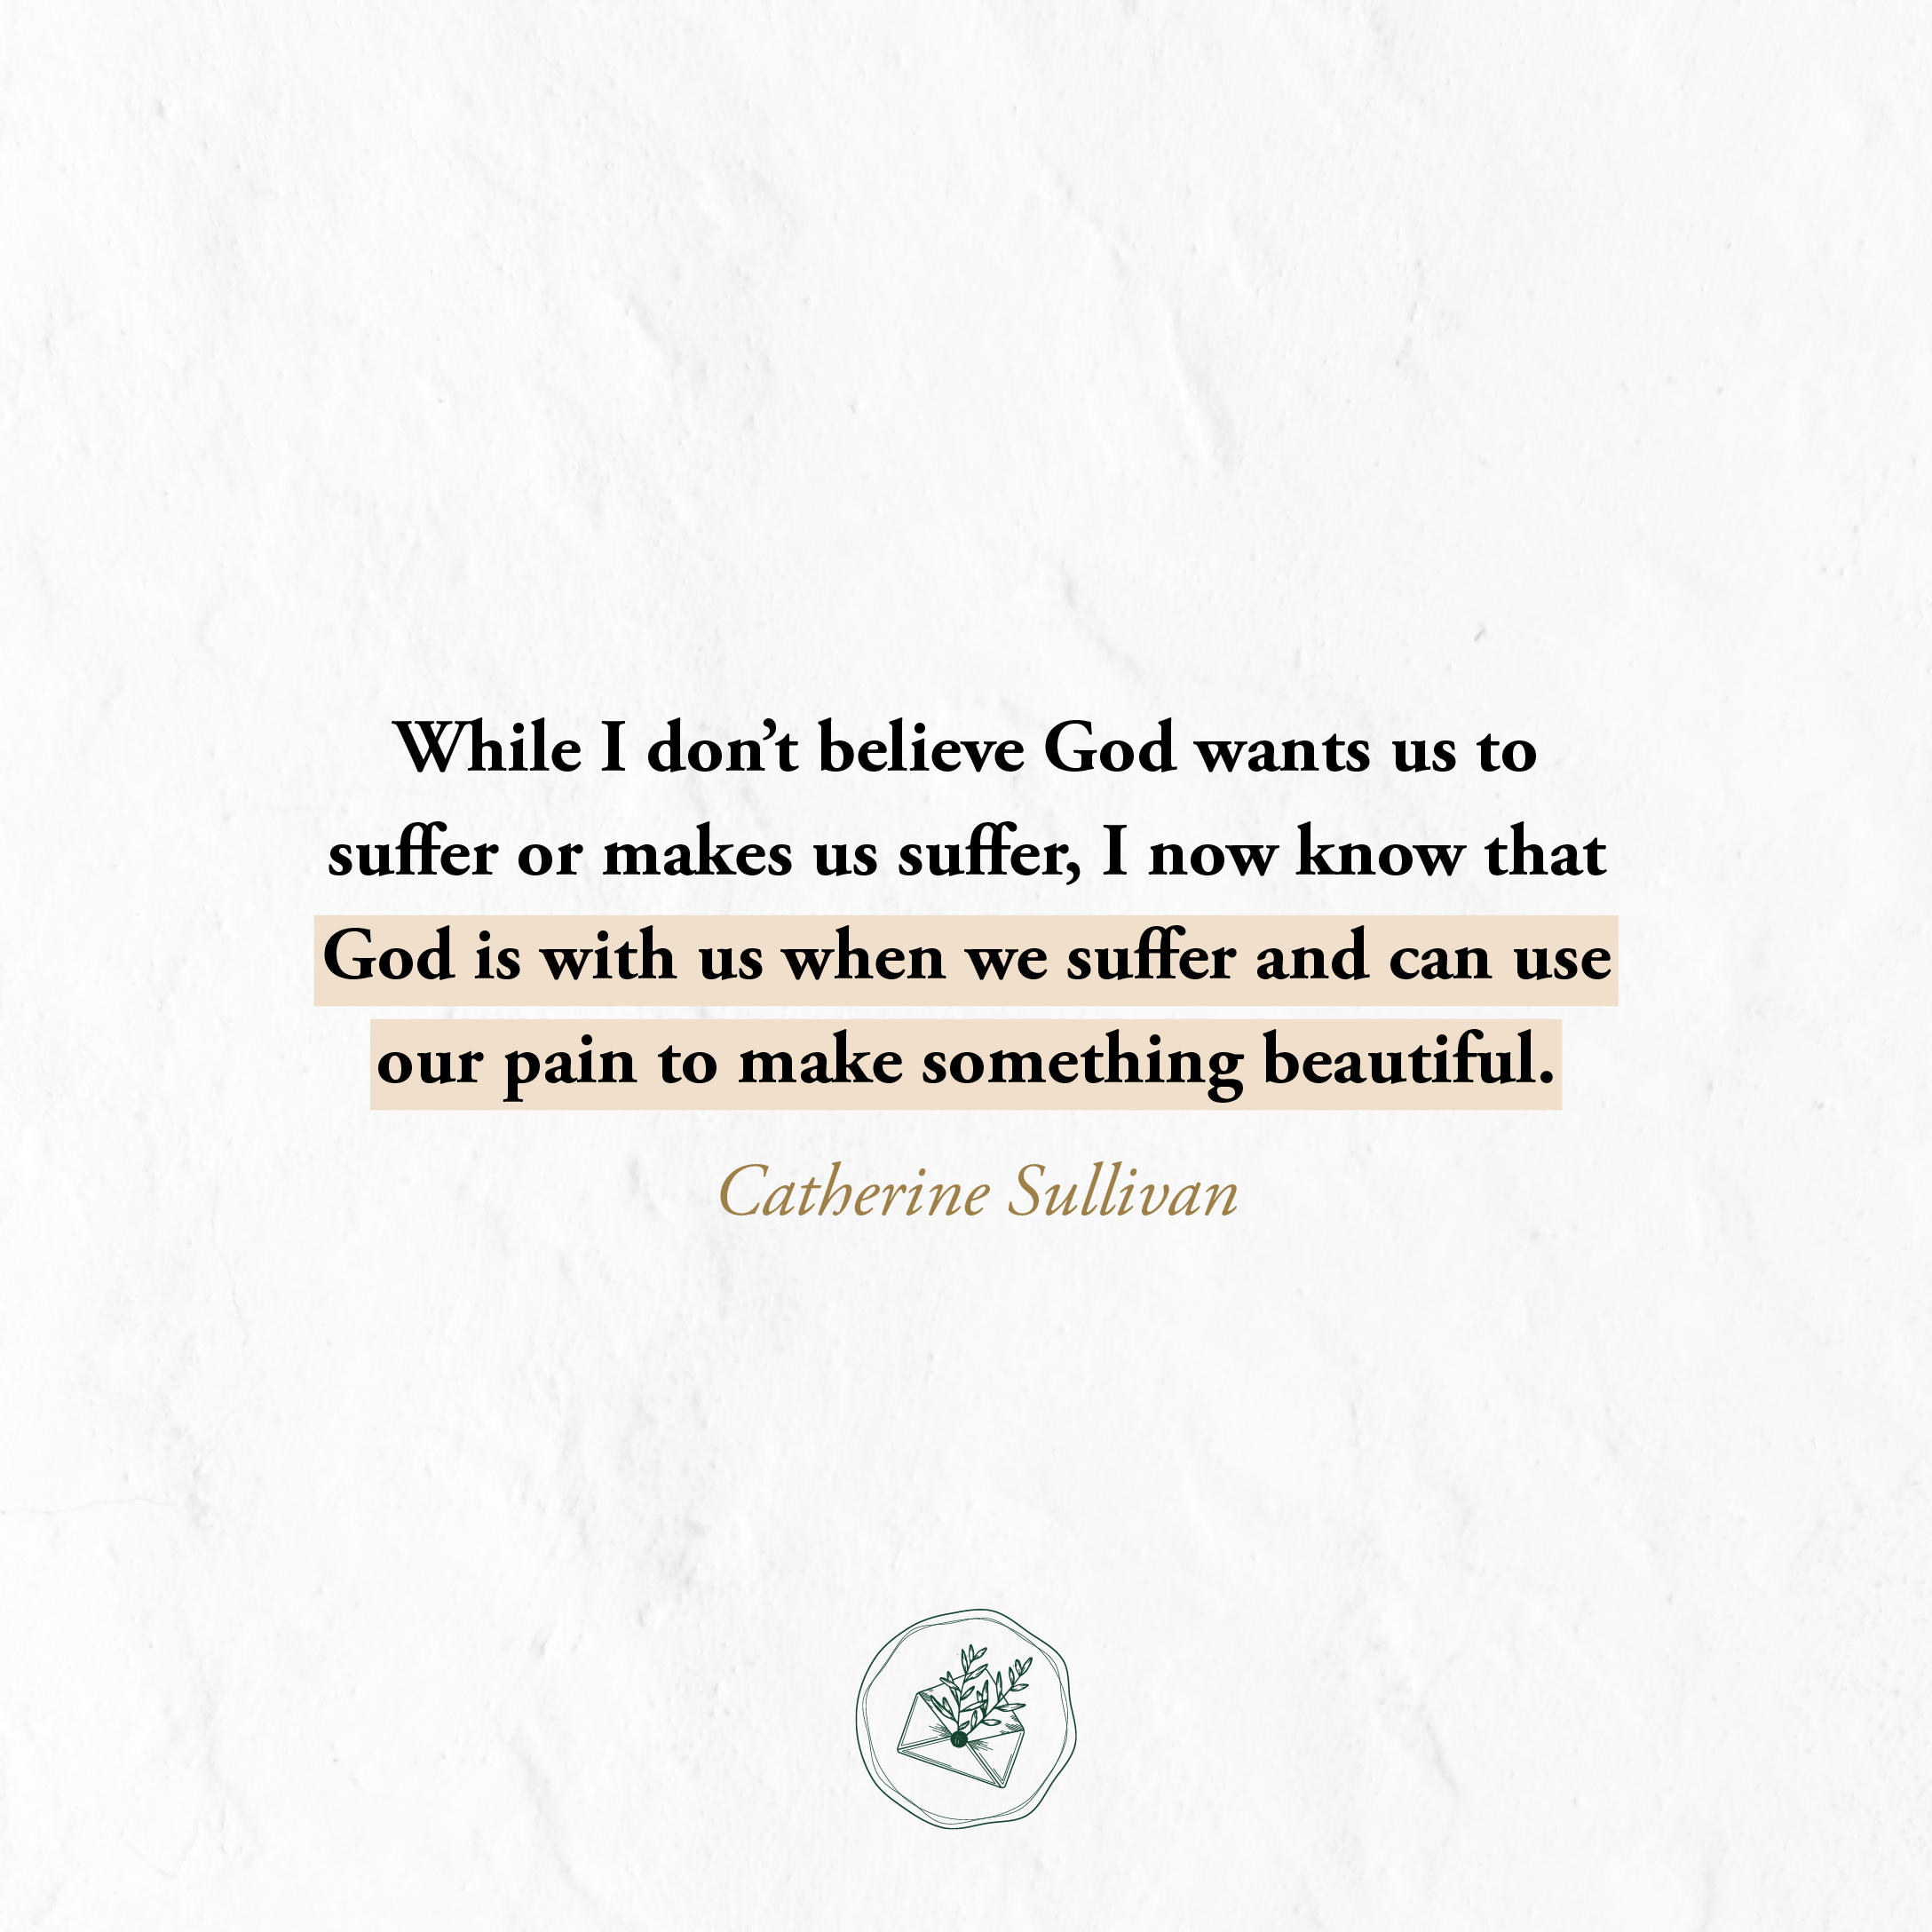 The Catholic Woman - Uniting the Pain of Endometriosis to